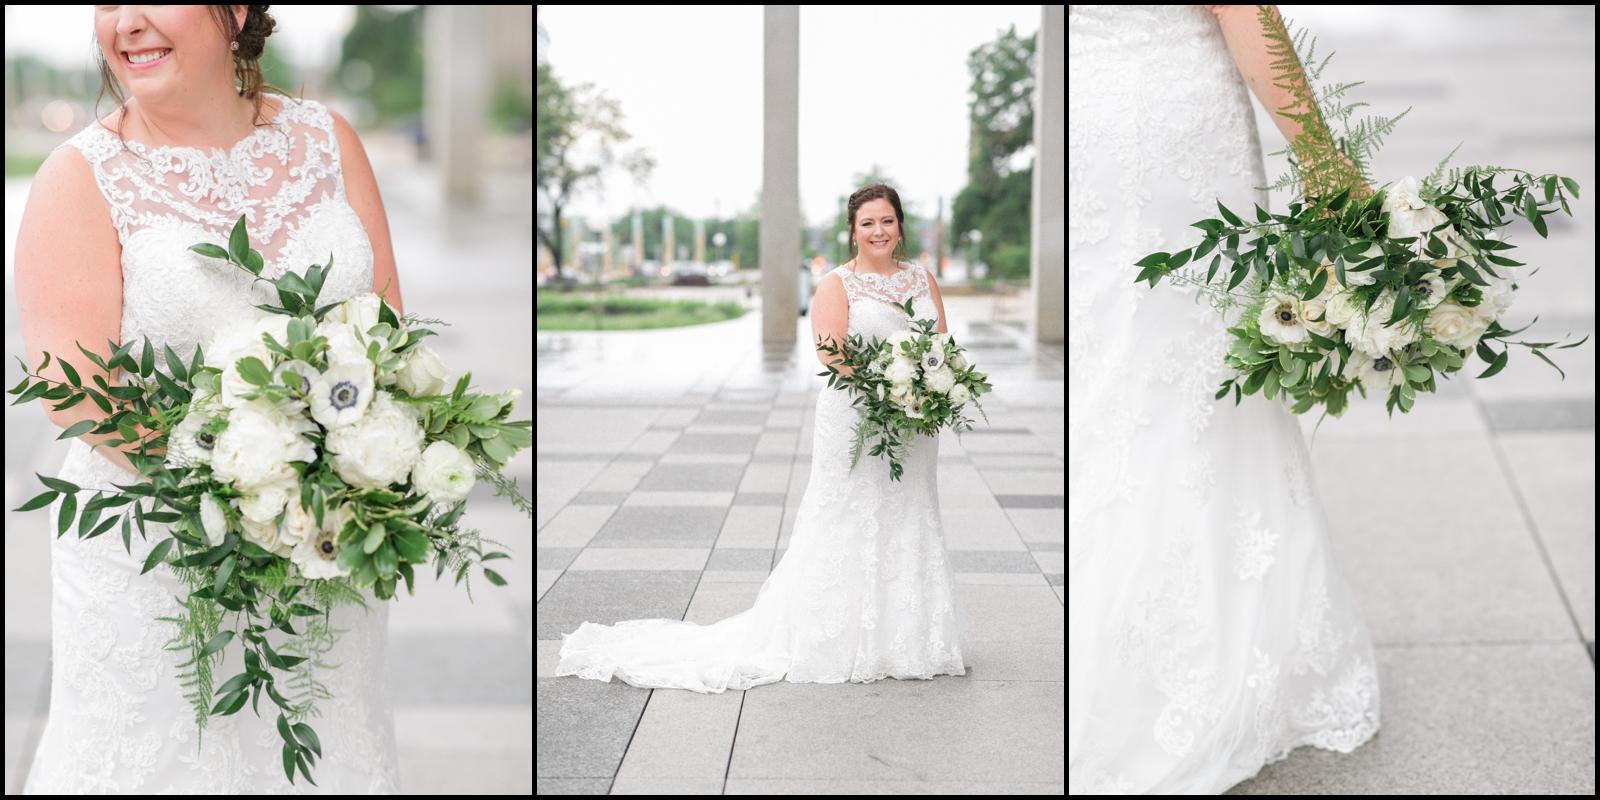 Bride wedding dress and bridal bouquet